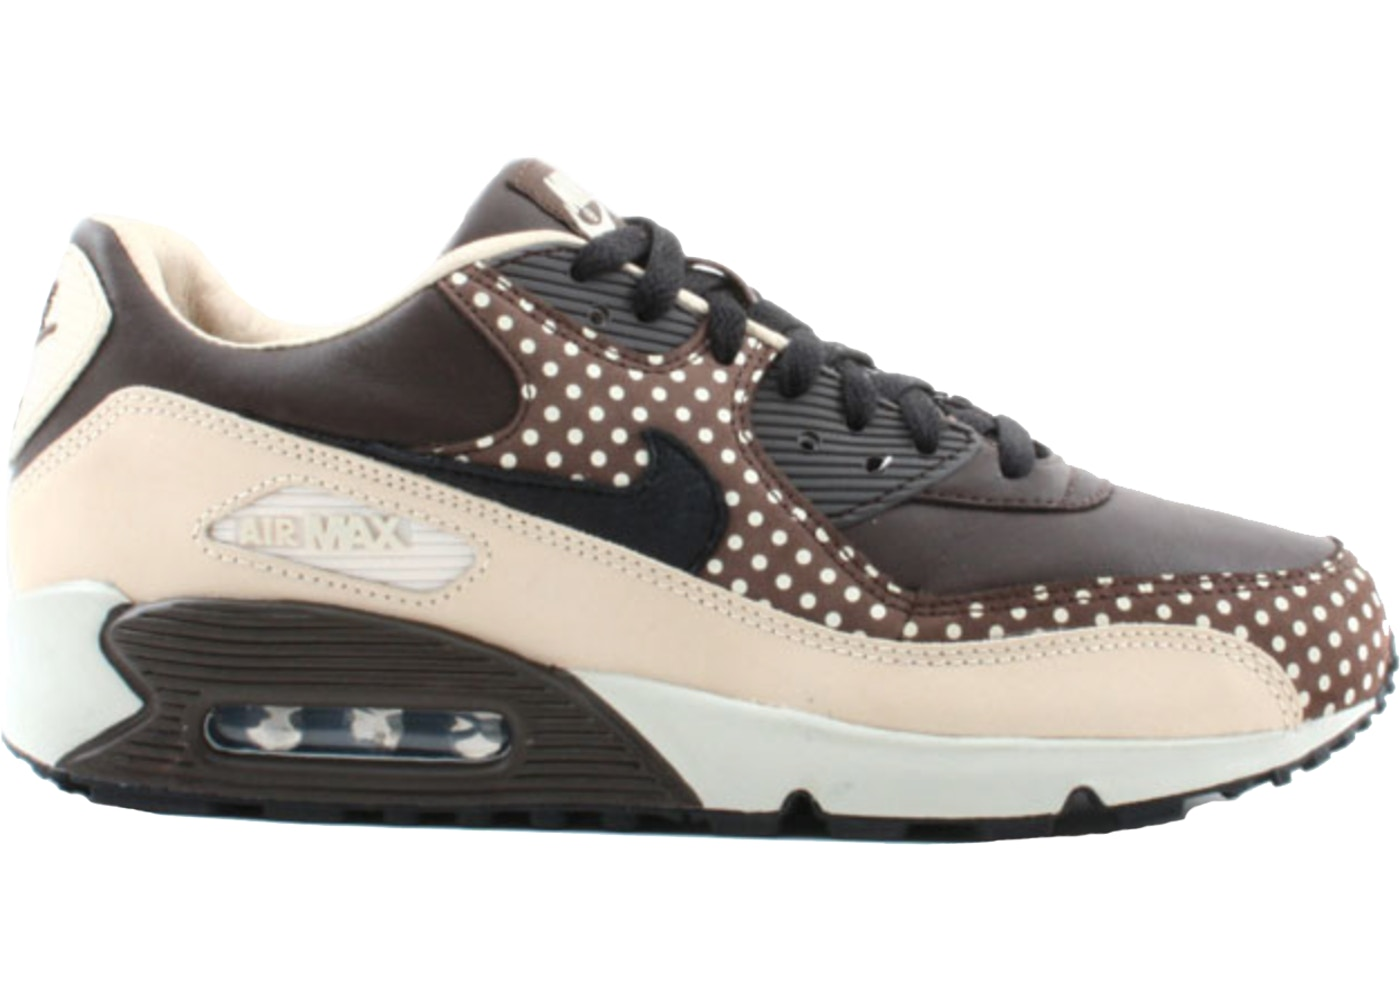 san francisco 52095 3ce98 Air Max 90 Footpatrol Brown